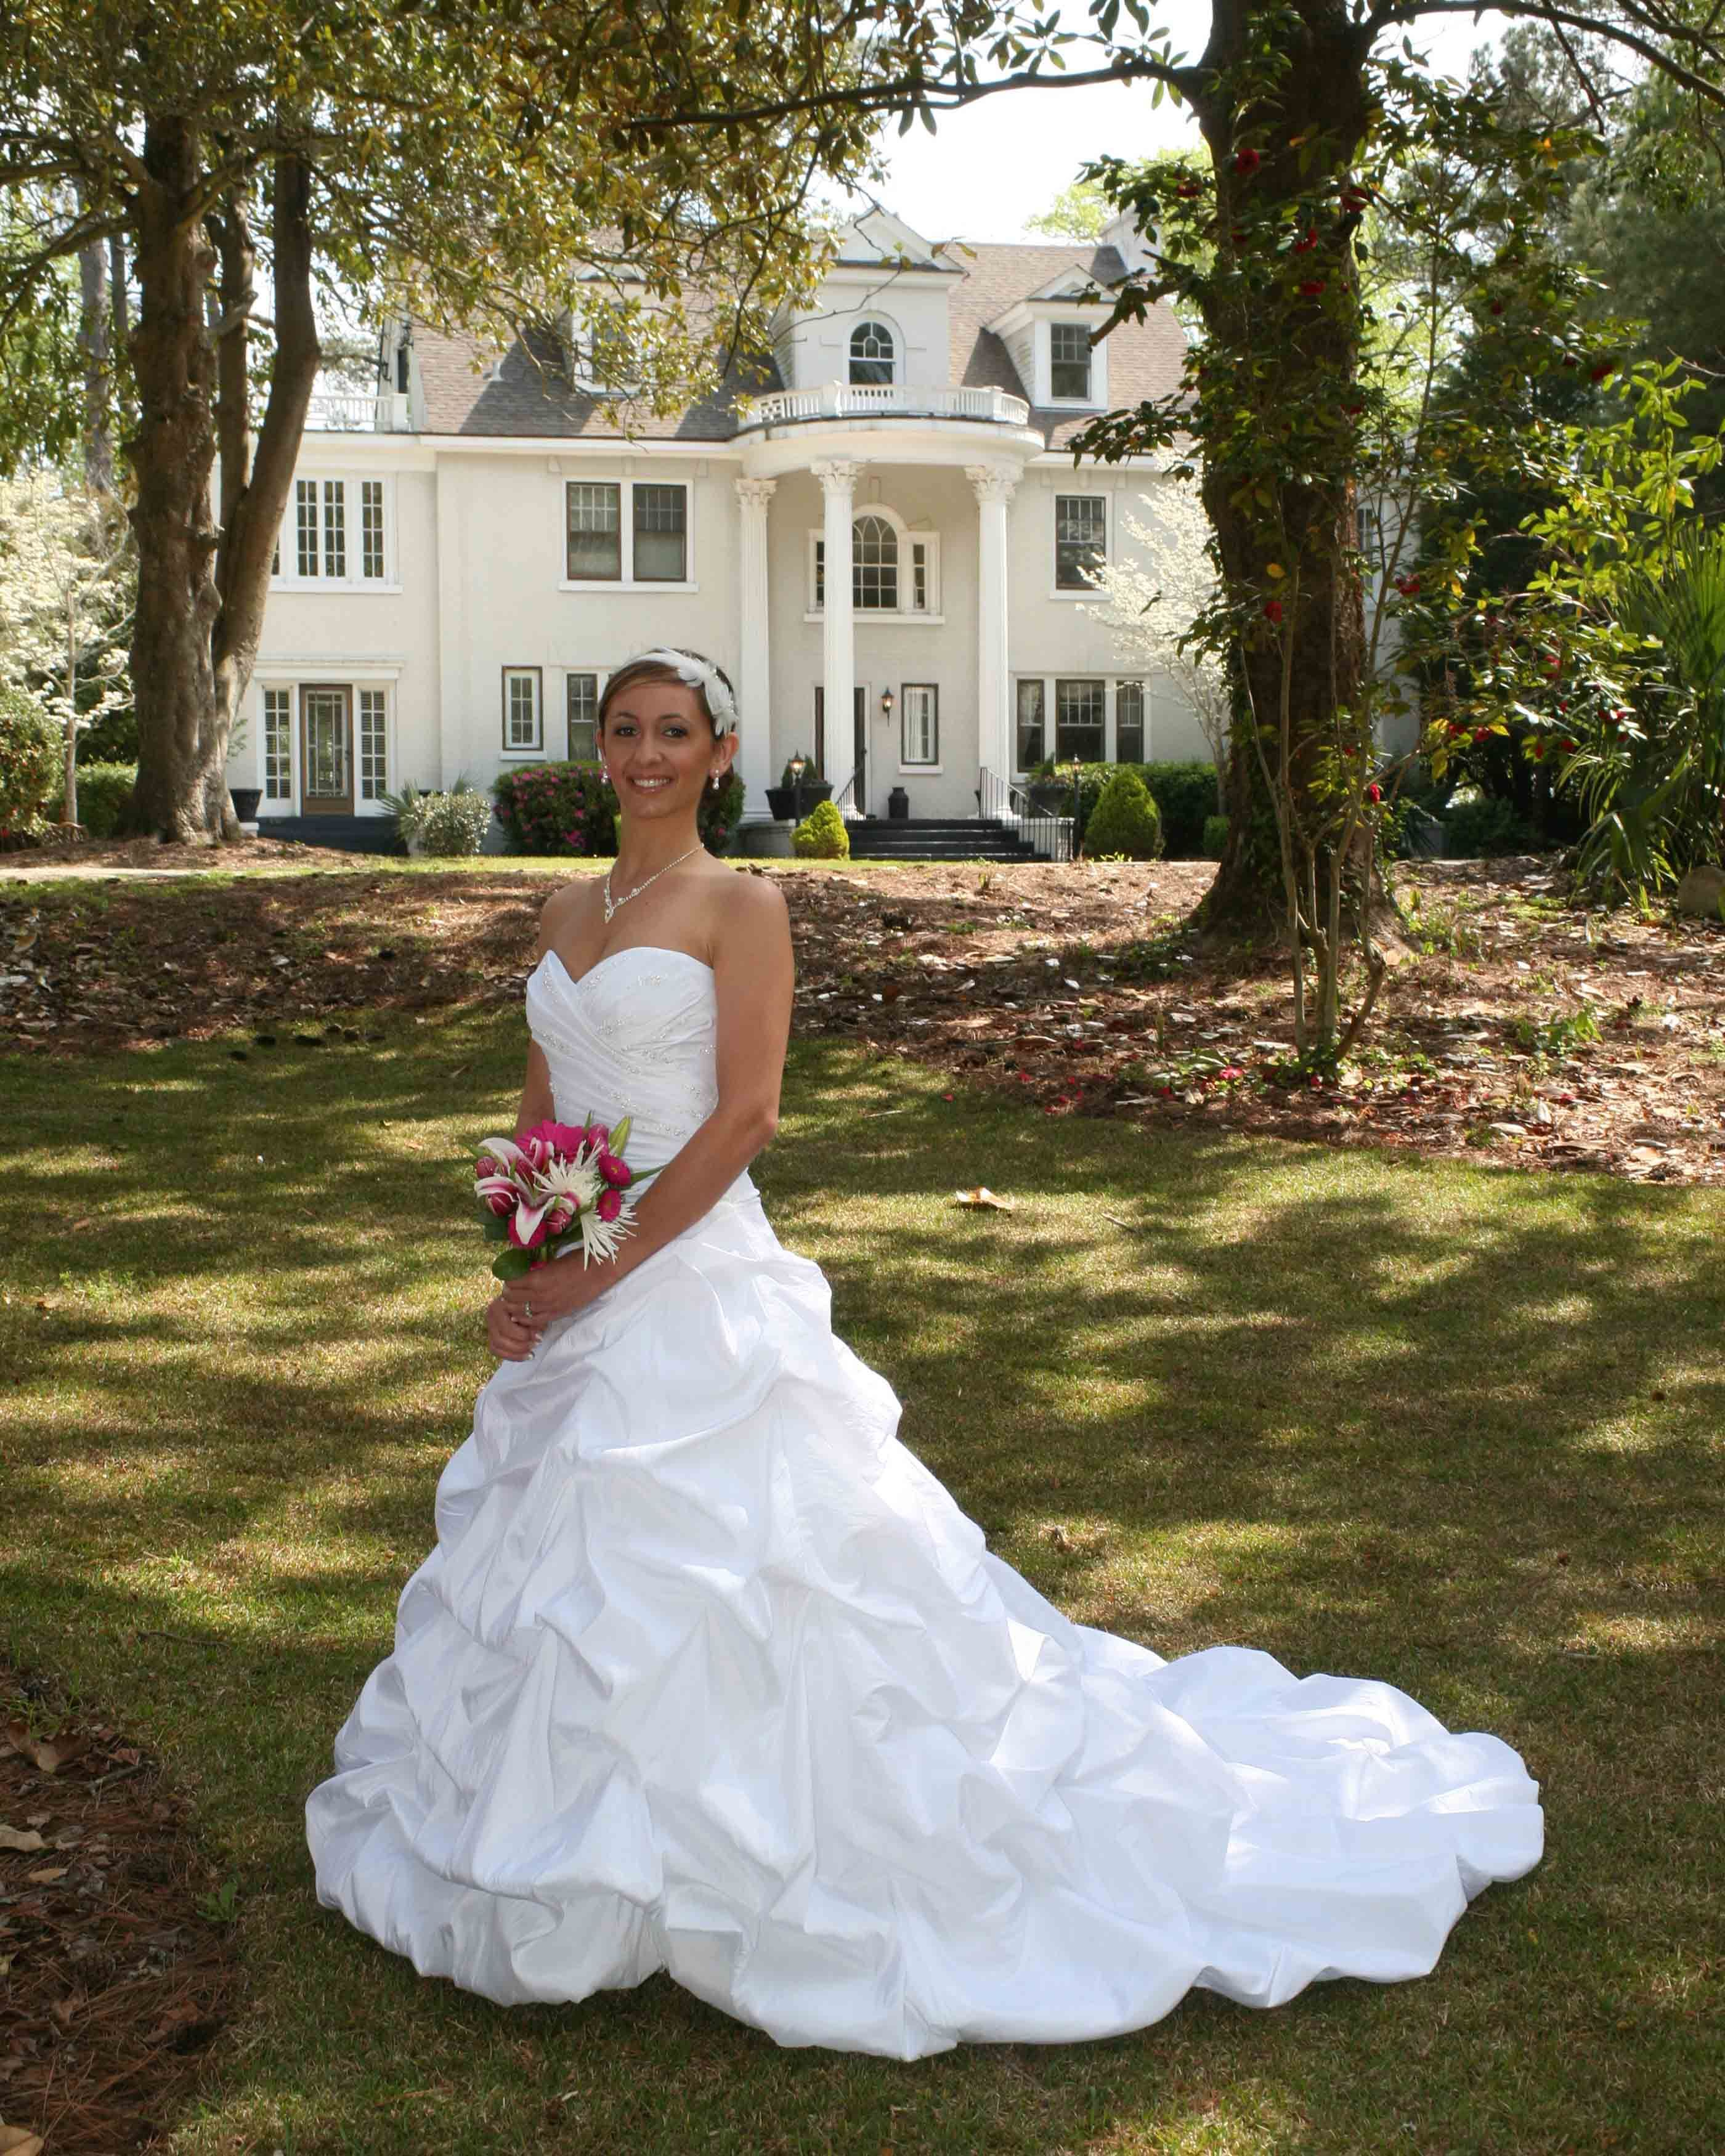 North beach plantation weddings  Bridal Portraits would be great here Wedding Venue u Vacation